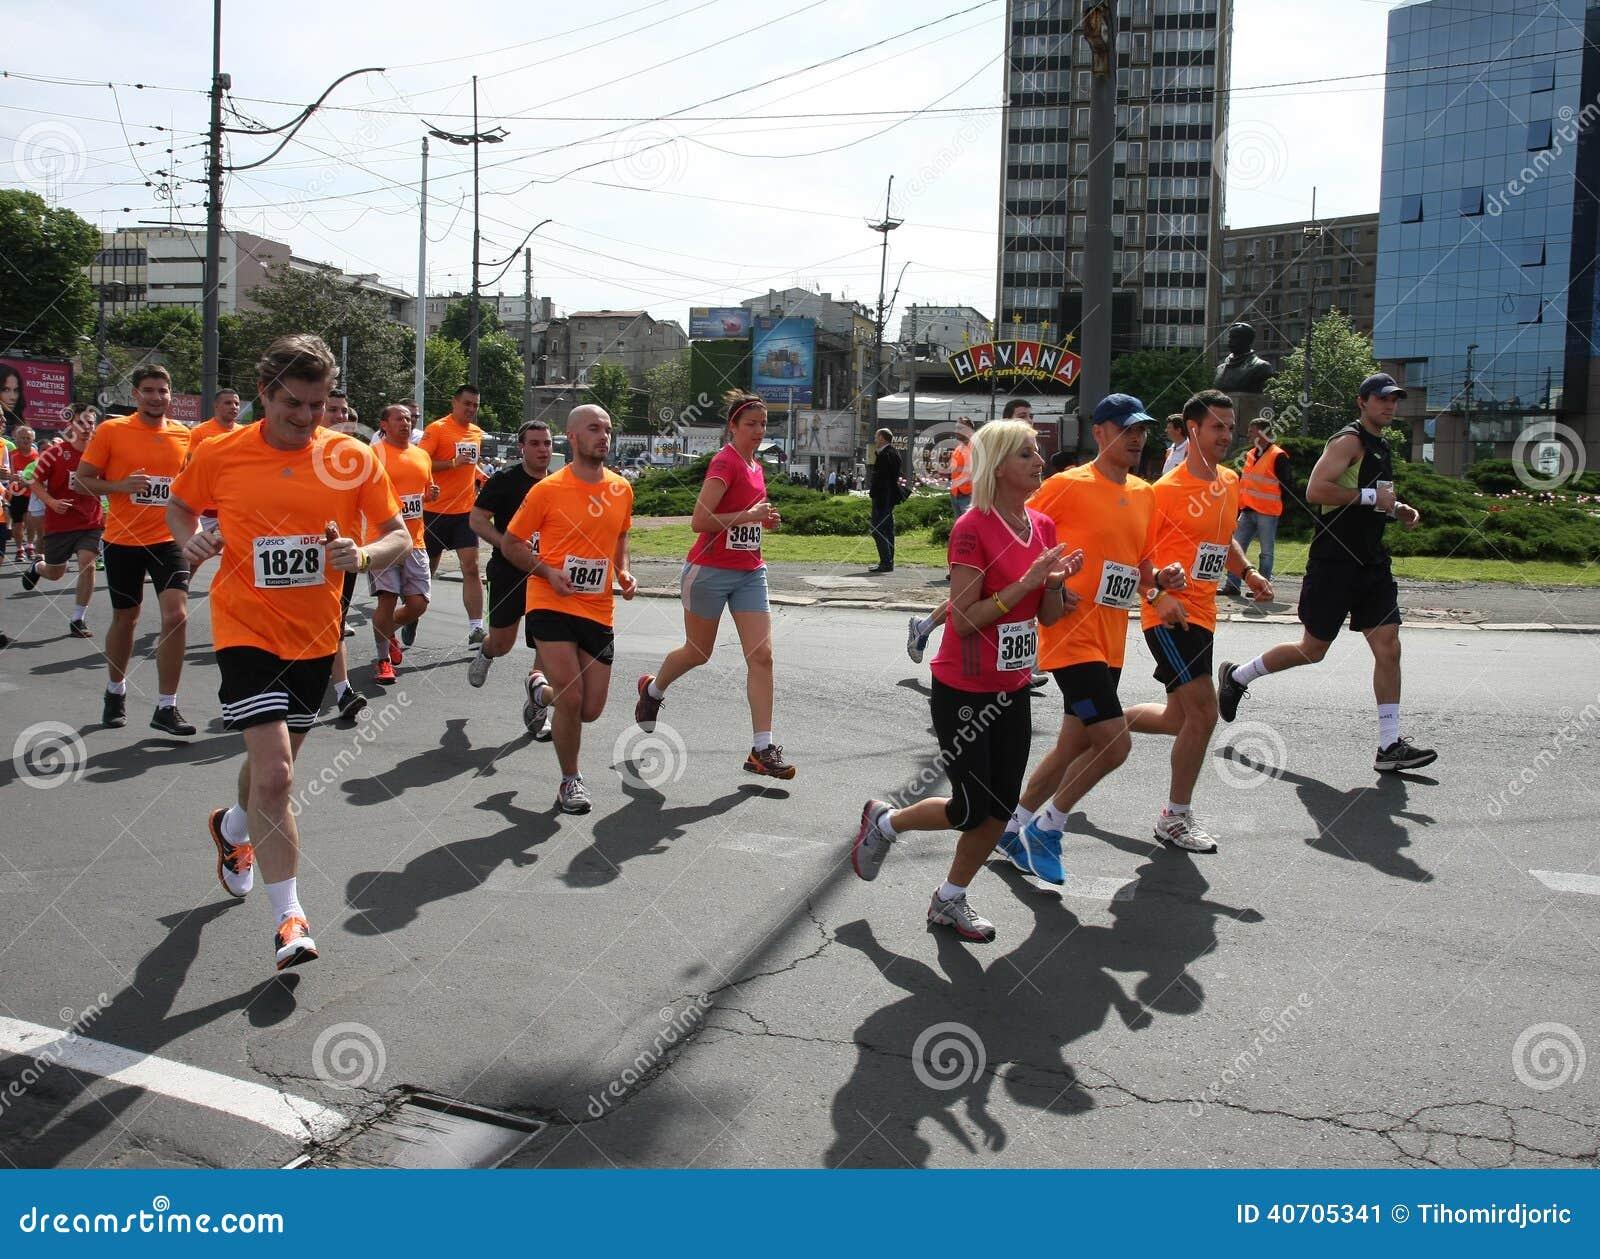 Belgrade Marathon 2014.